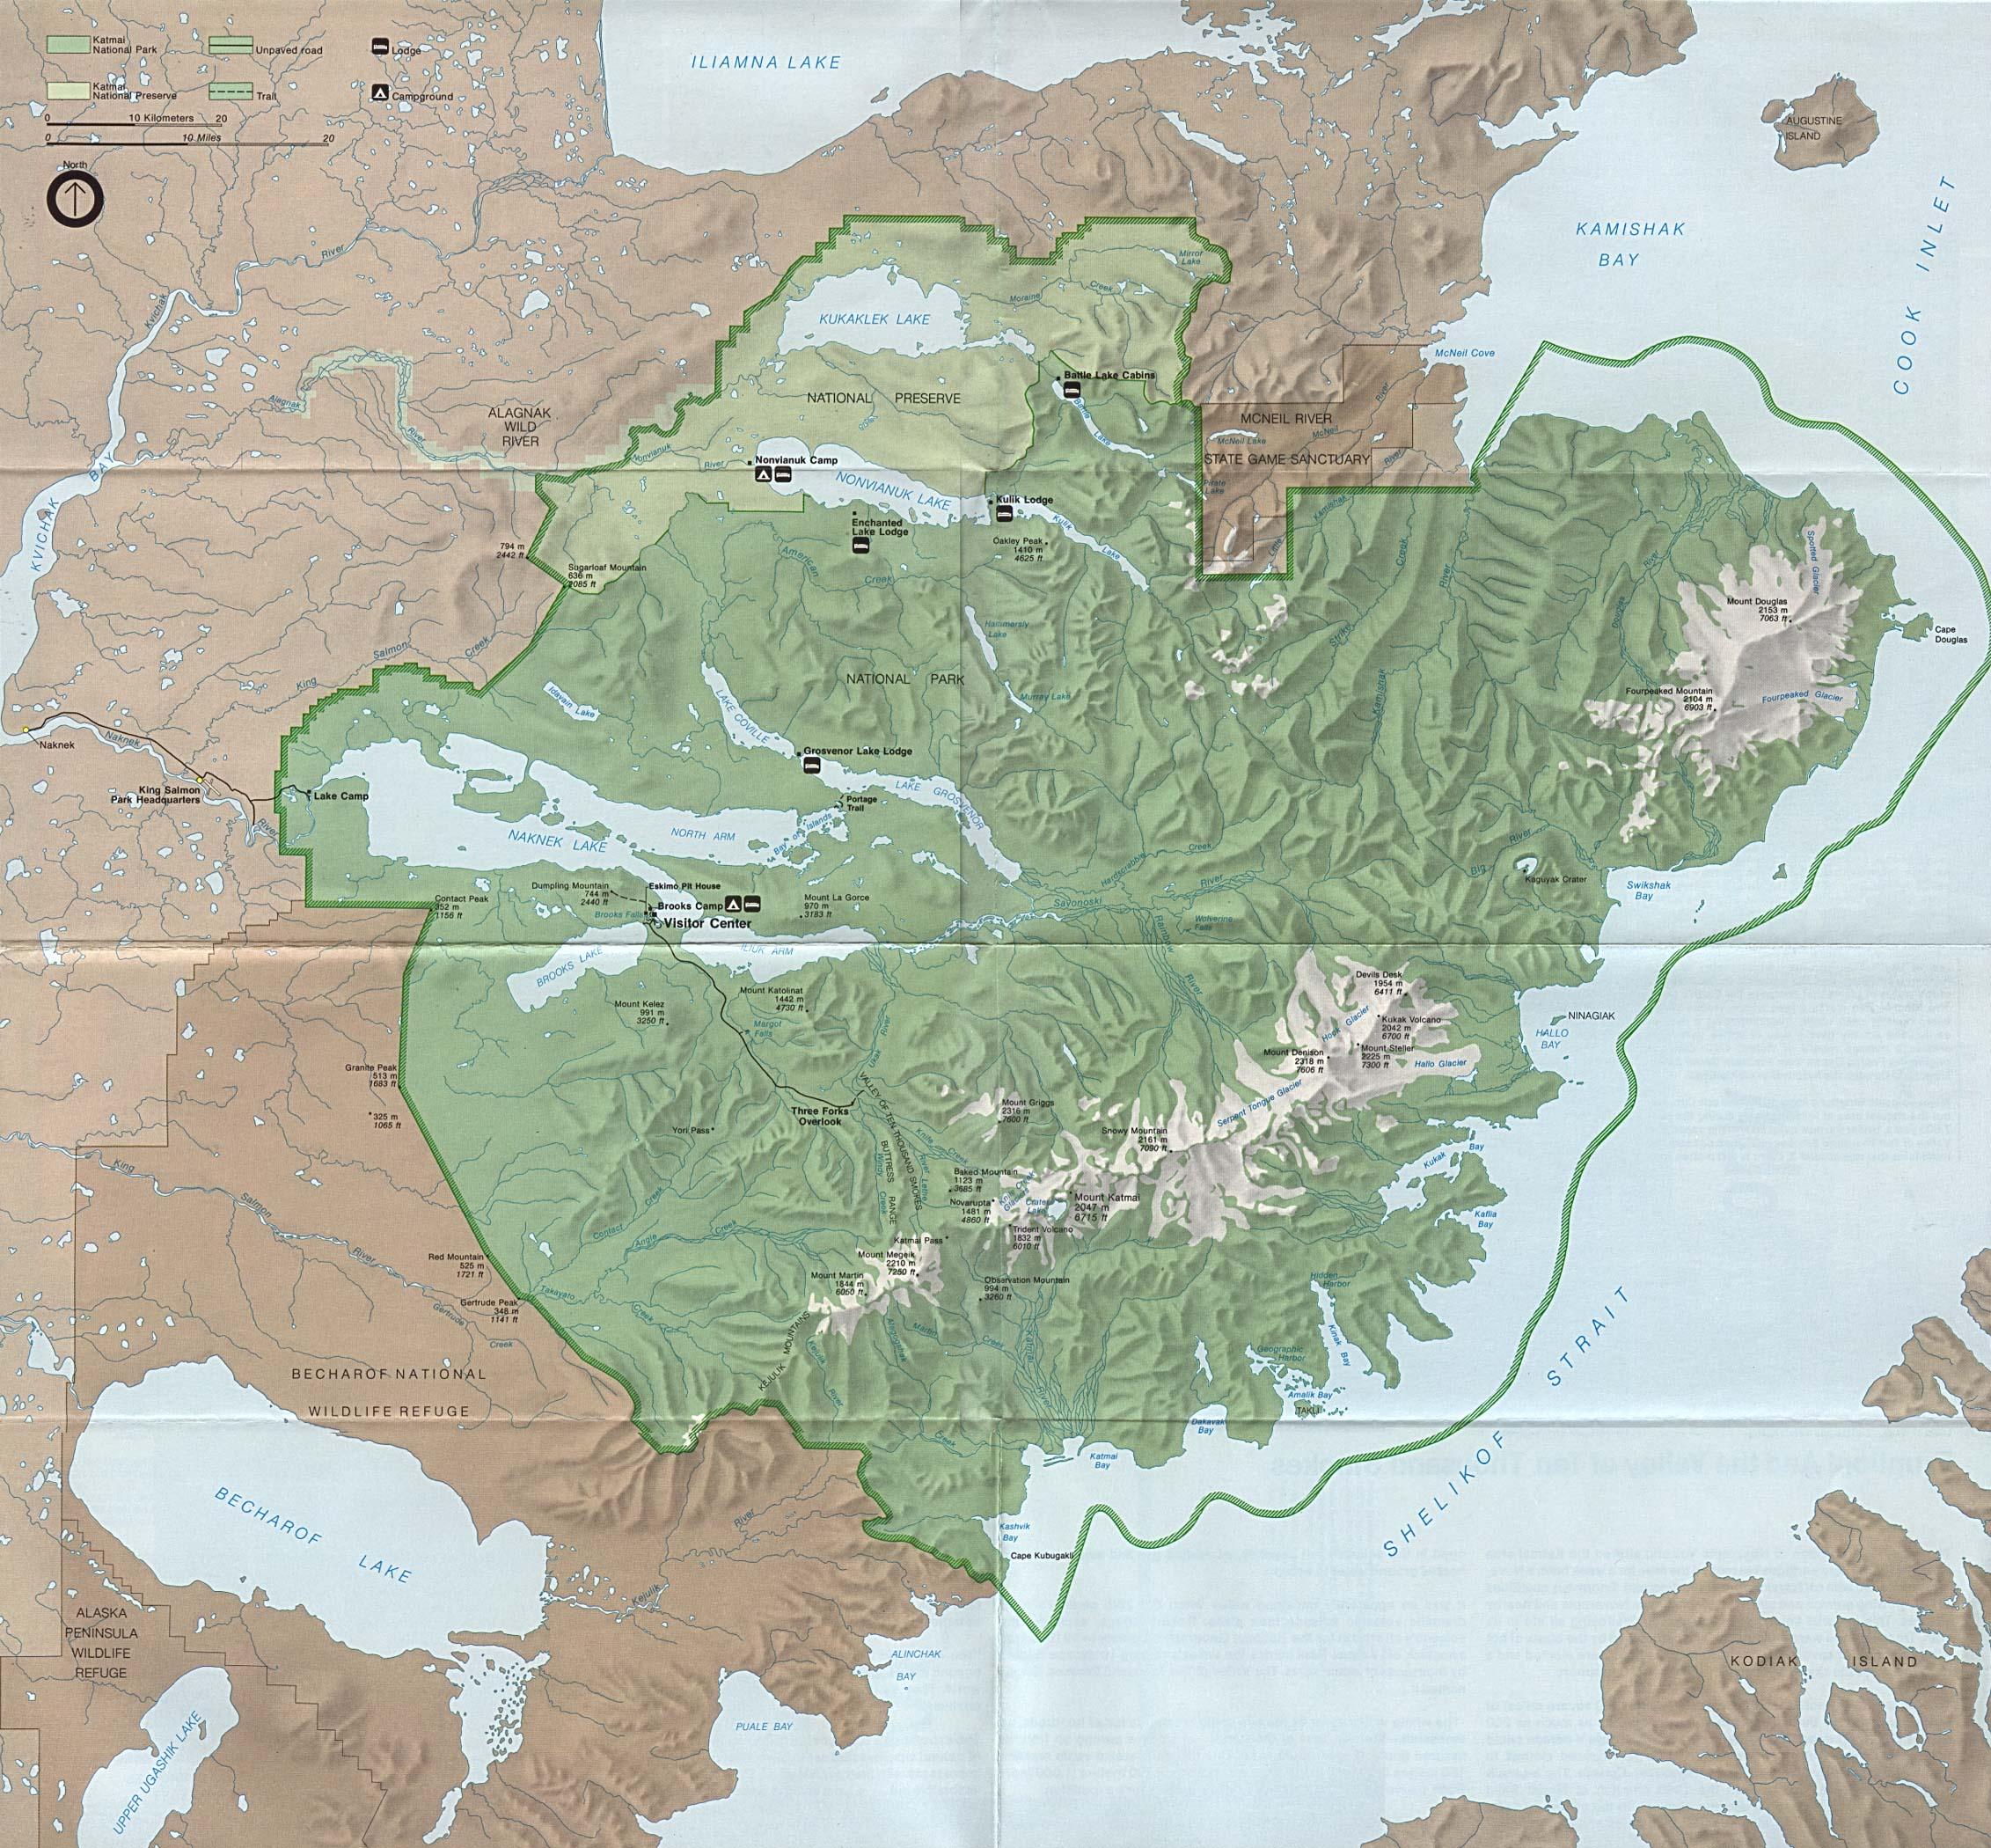 Alaska Maps - Perry-Castañeda Map Collection - UT Liry Online on